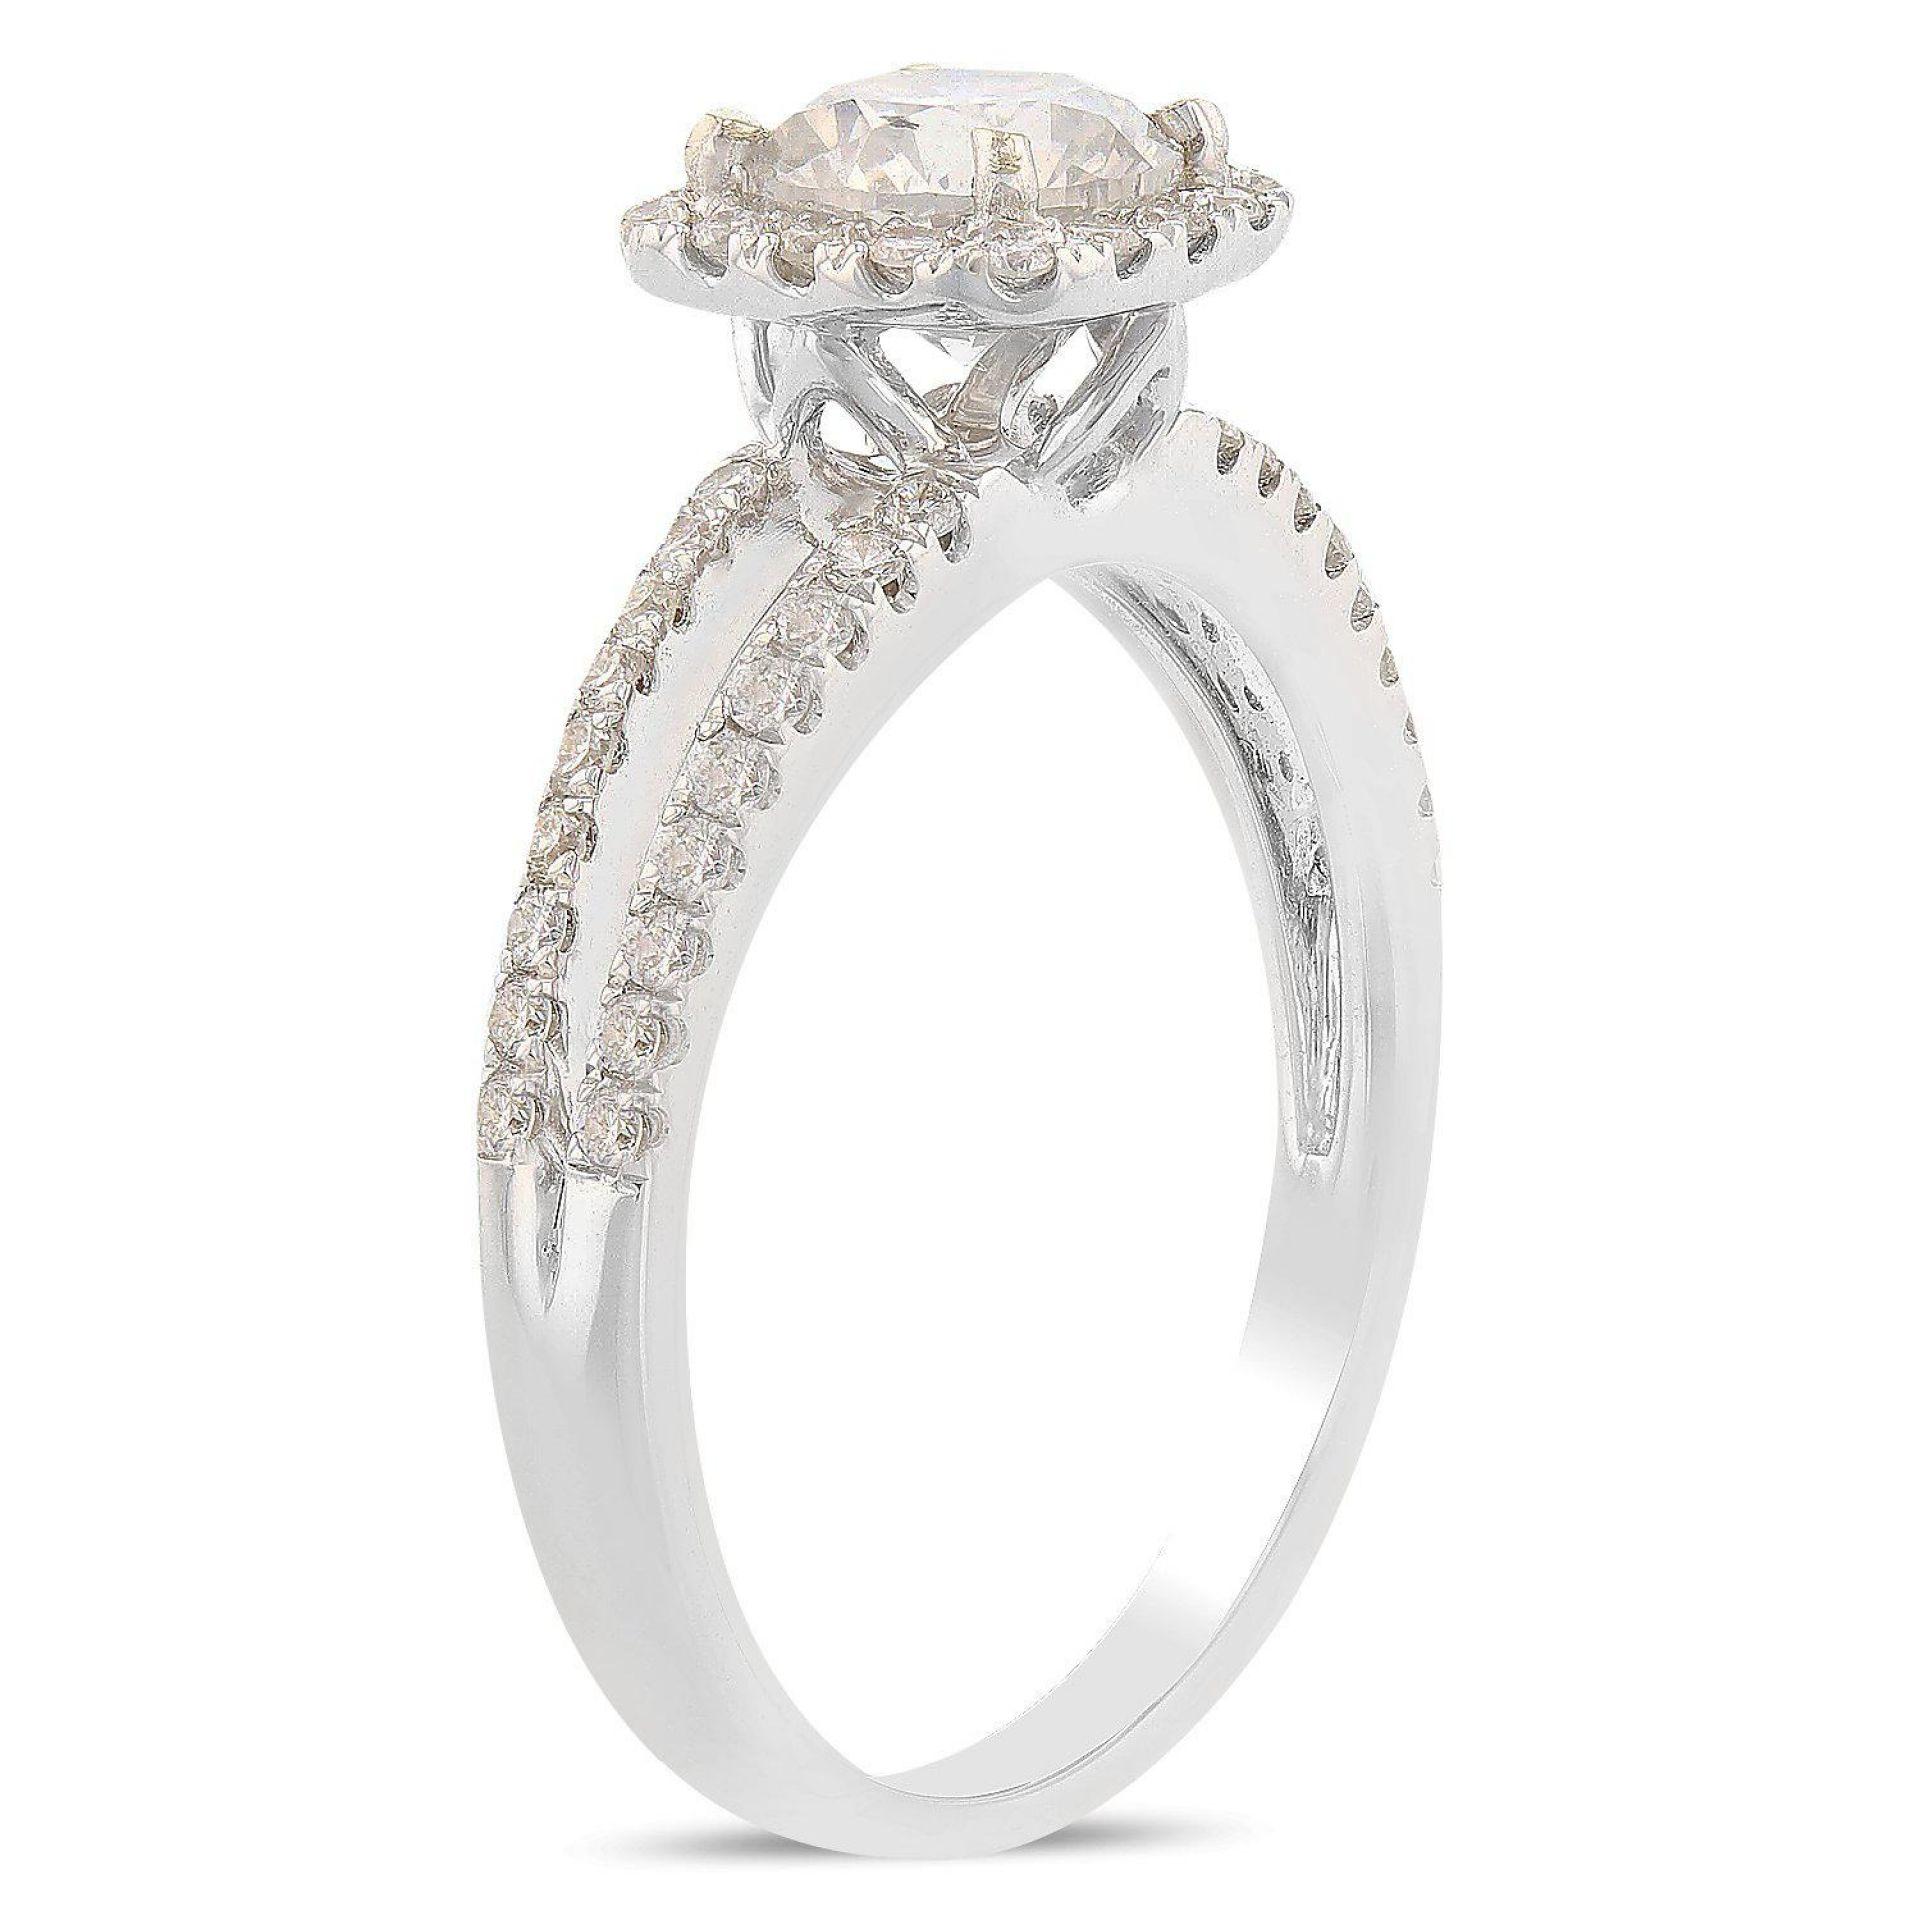 0.92ct SI2 CLARITY CENTER Diamond 18KT White Gold Ring (1.25ctw Diamonds) EGL US